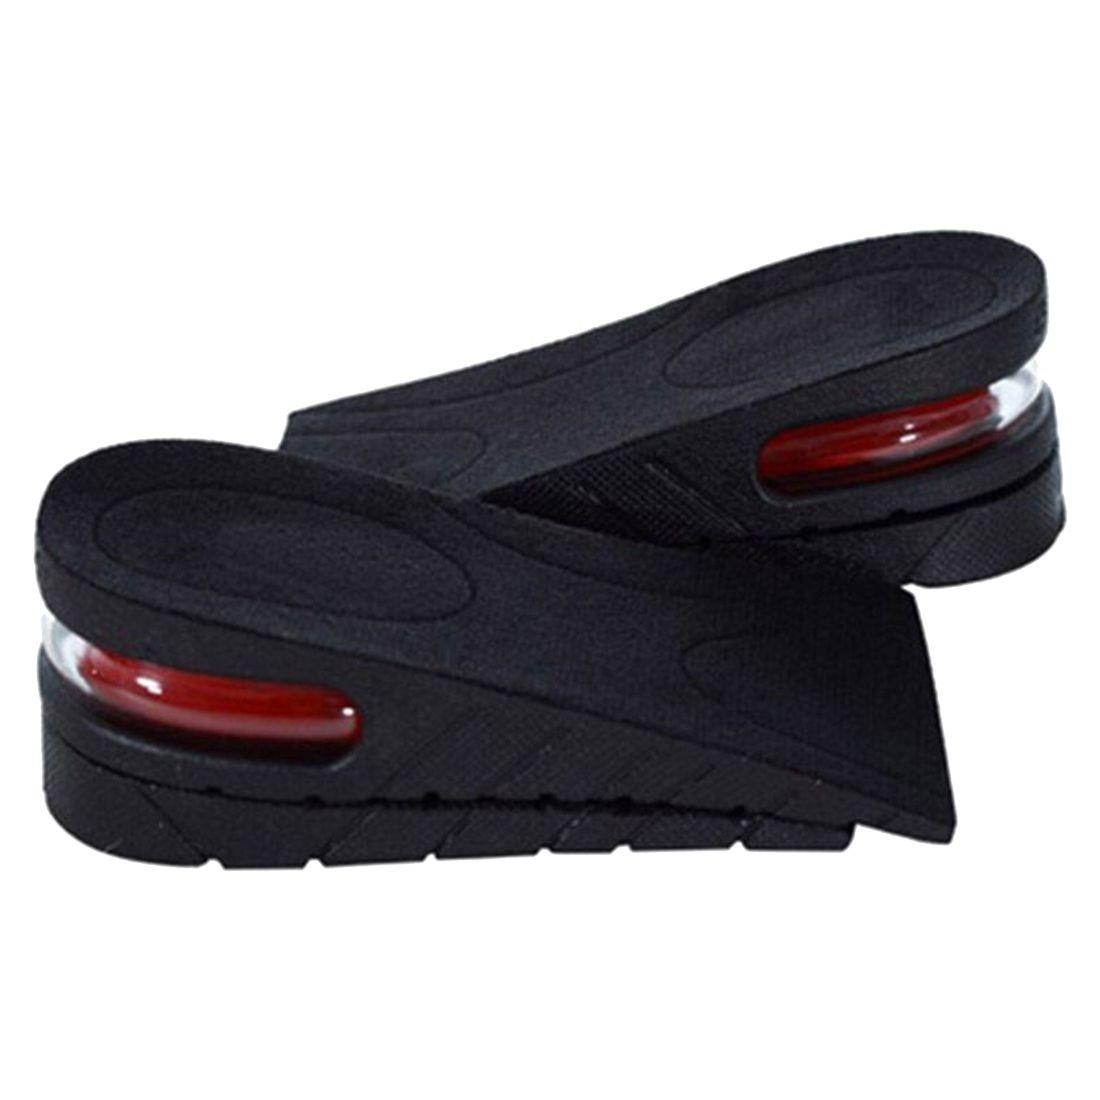 Fashion Boutique Men Women Shoe Insole Air Cushion Heel insert Increase Tall Height Lift 5cm